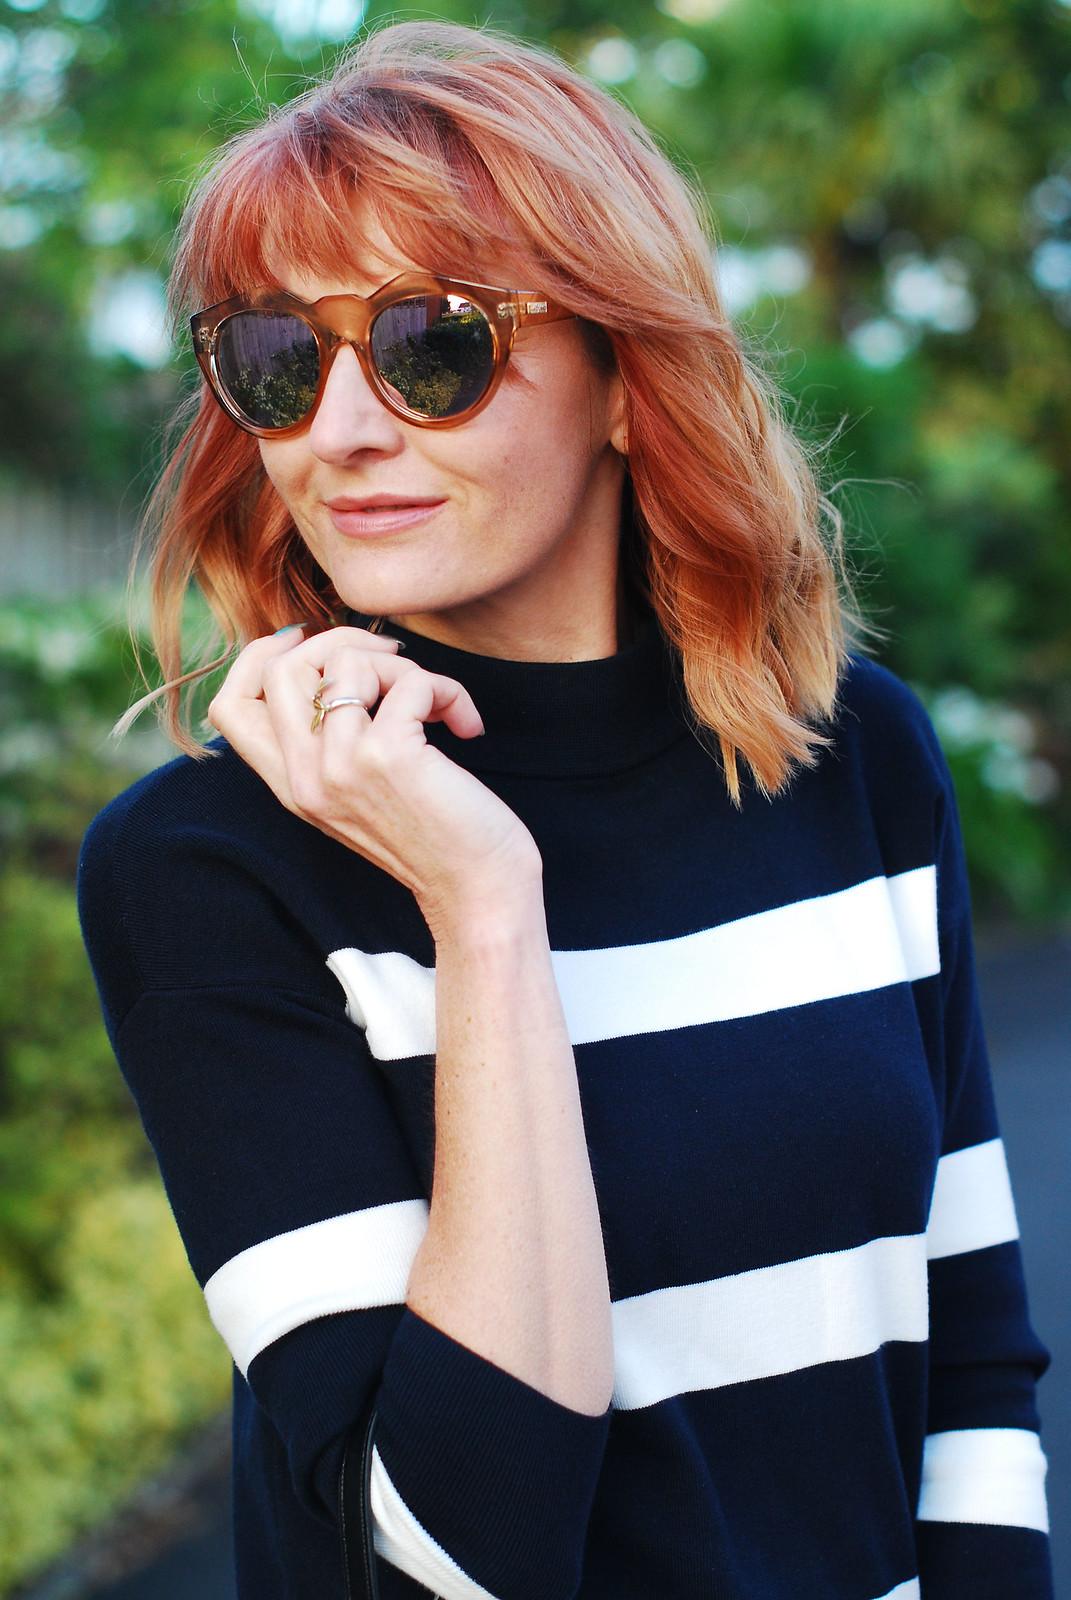 Navy/white striped sweater, round mirrored sunglasses - Hobbs SS16 | Not Dressed As Lamb